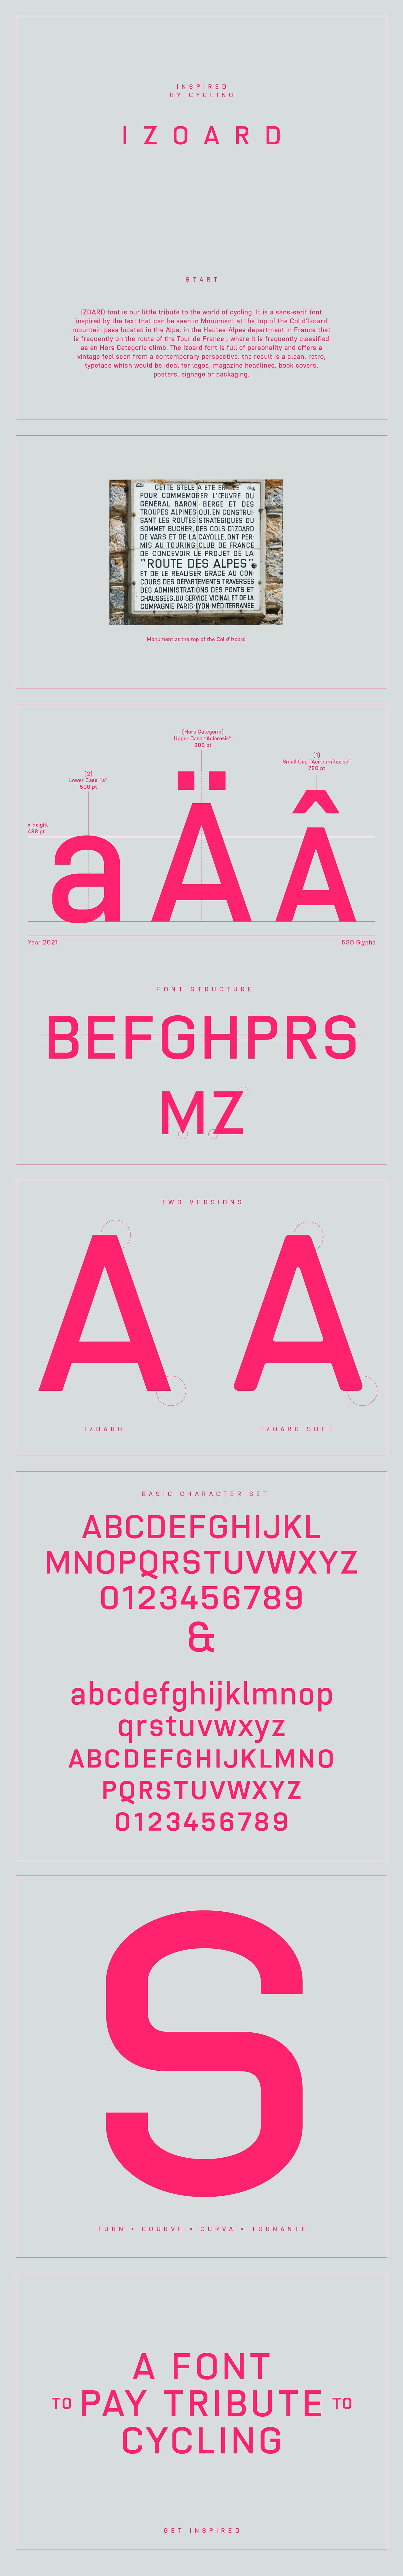 Cycling font sans serif Display poster vintage